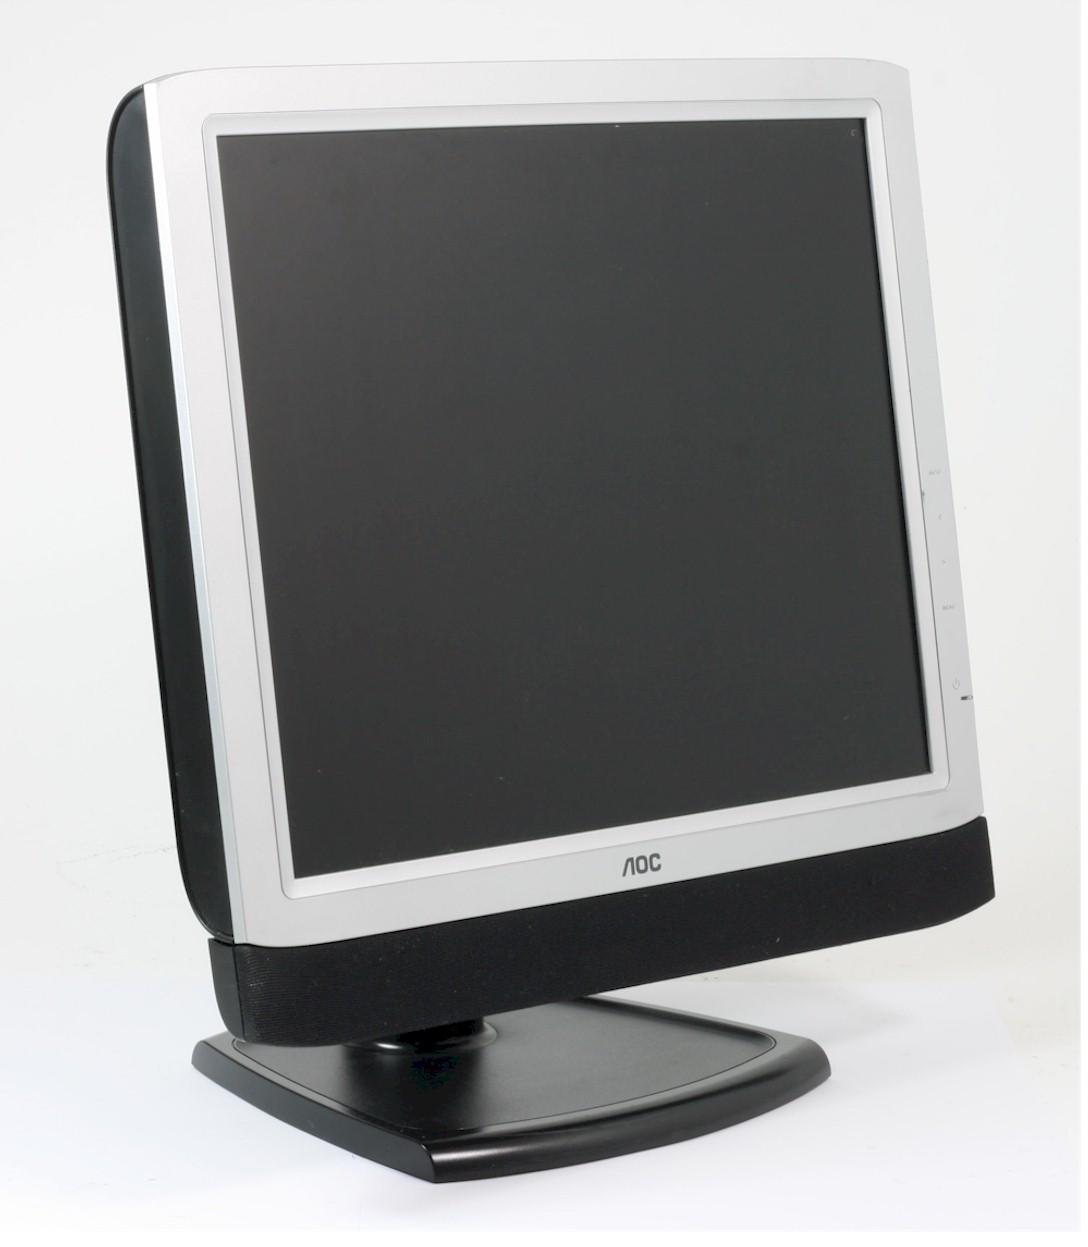 "AOC LM929 Bildschirm 19 Zoll Monitor 48,3 cm LCD Flachbildschirm TFT 19"" gebraucht"